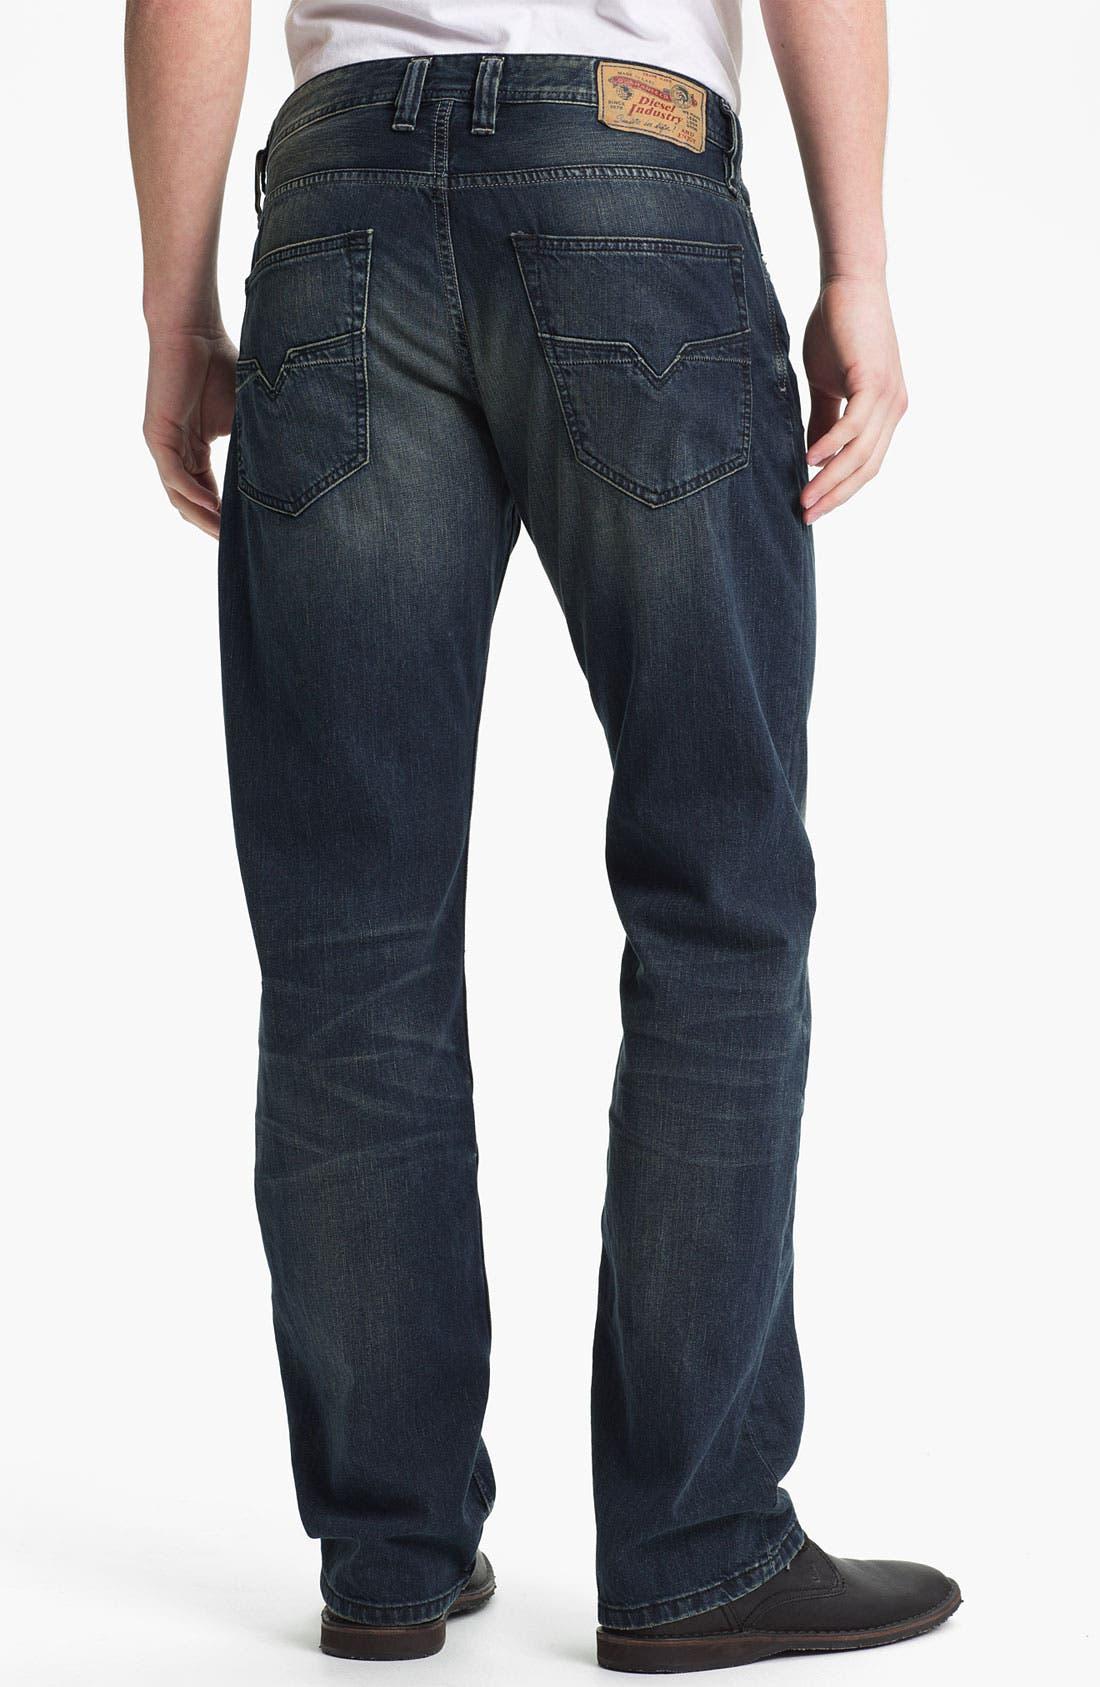 Alternate Image 1 Selected - DIESEL® 'Larkee' Straight Leg Jeans (0807U)